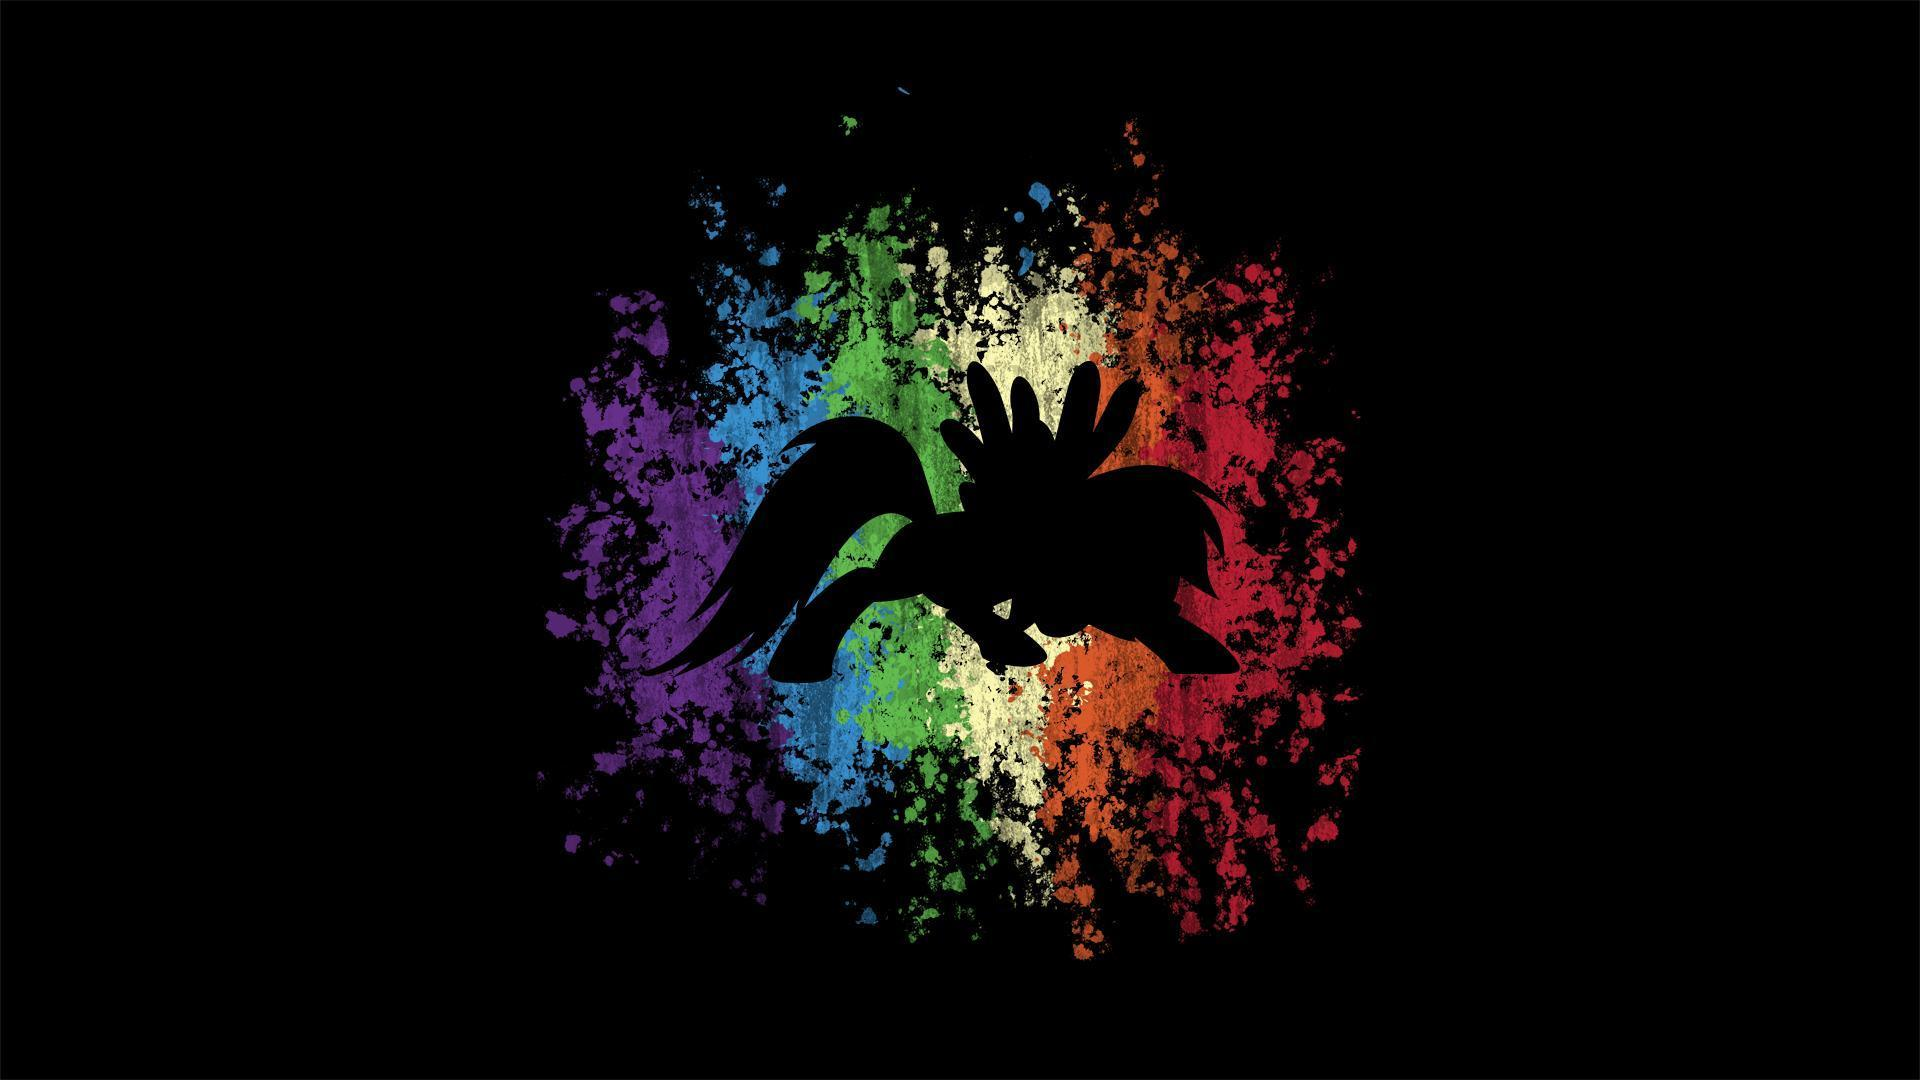 rainbow dash sphere background - photo #23